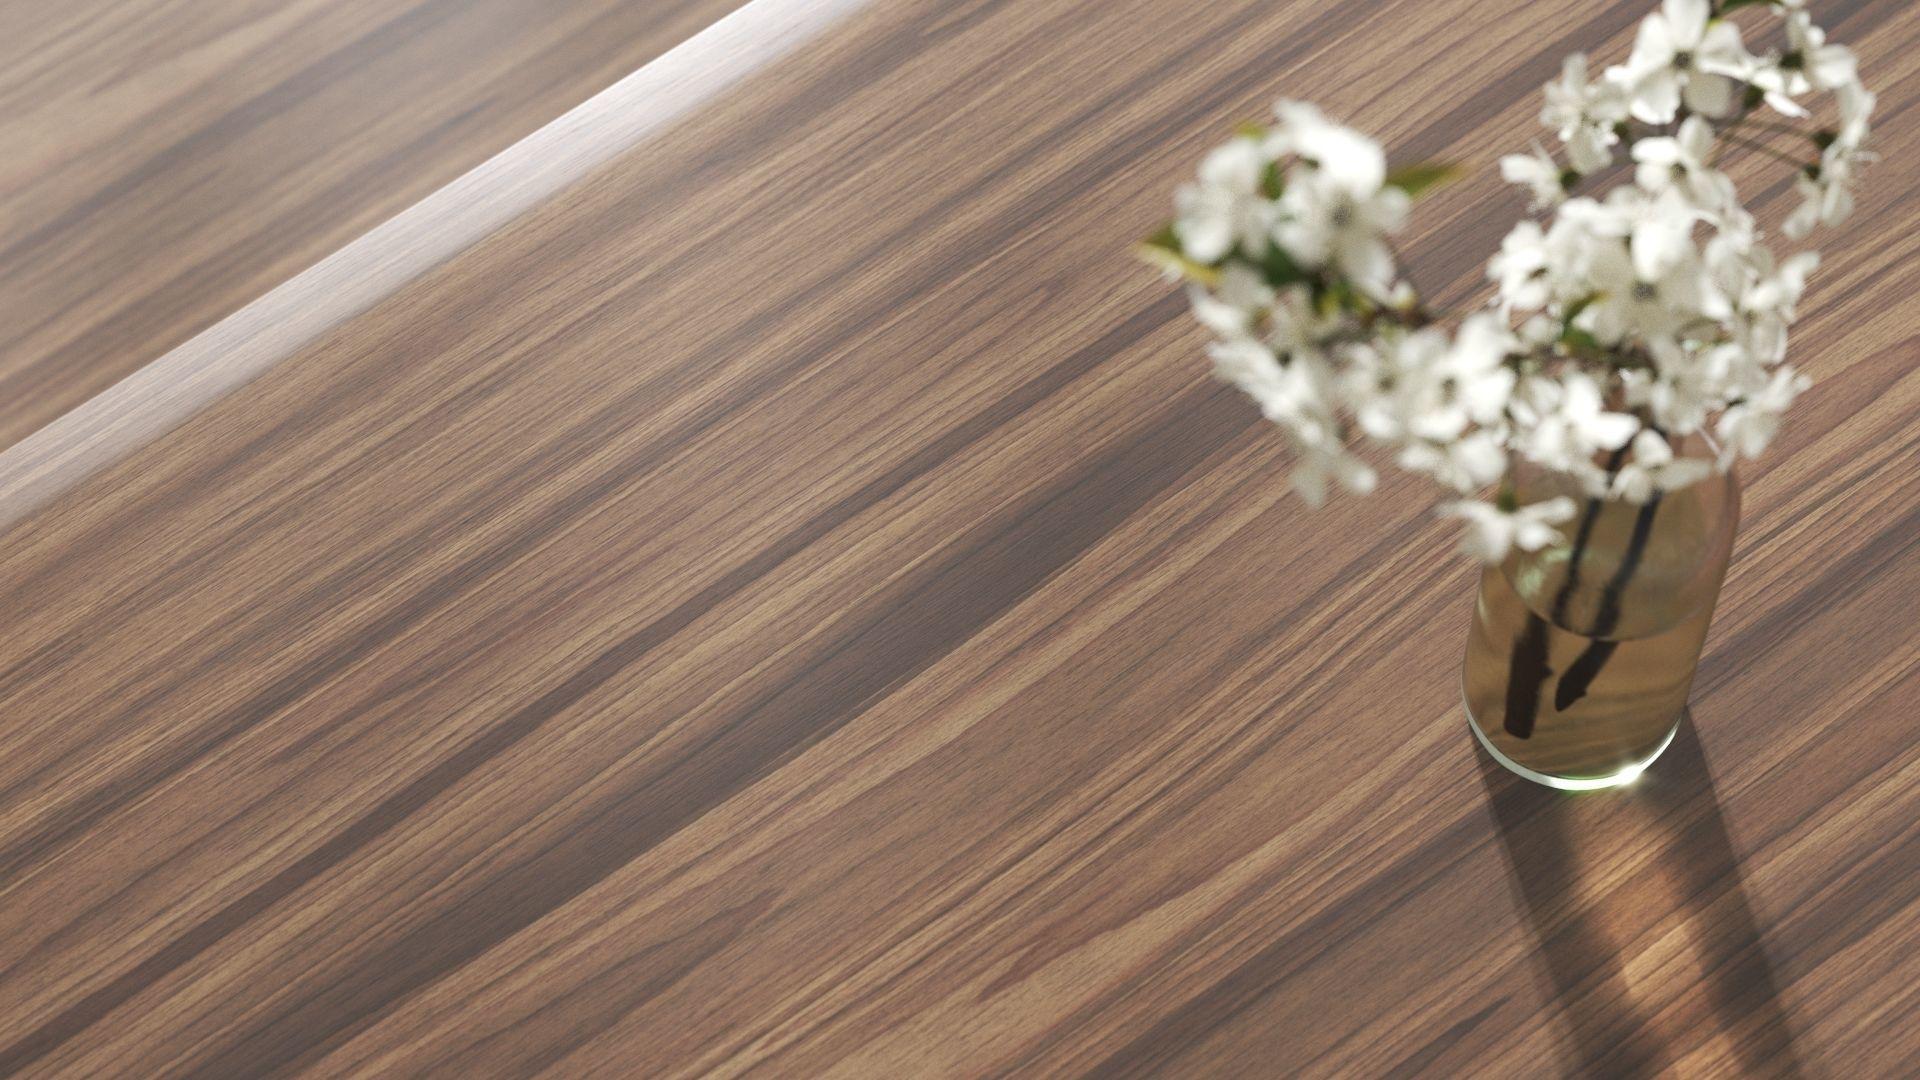 Walnut wood veneer texture